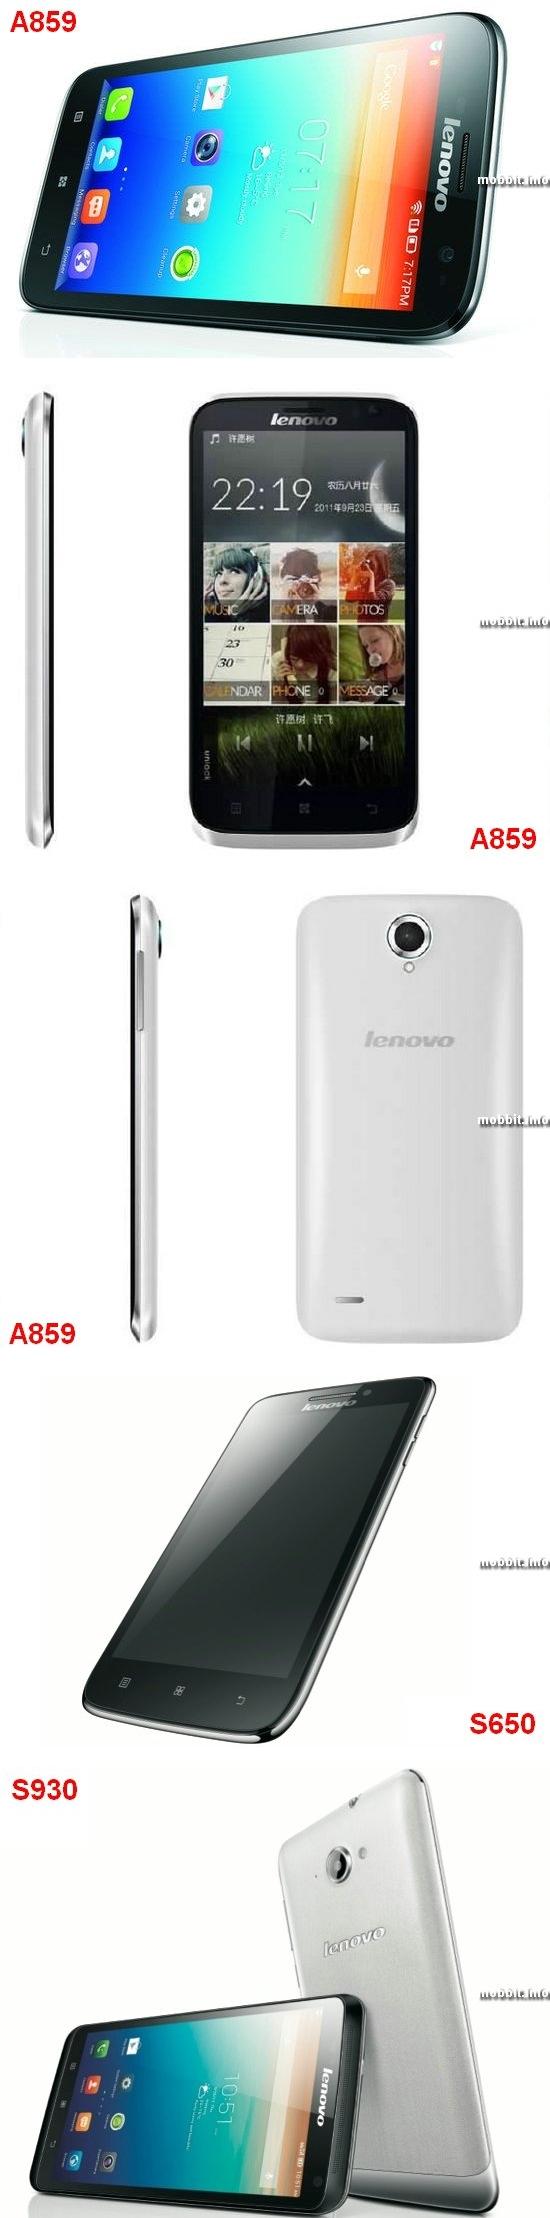 Lenovo A859, S930 и S650 – трио новых смартфонов